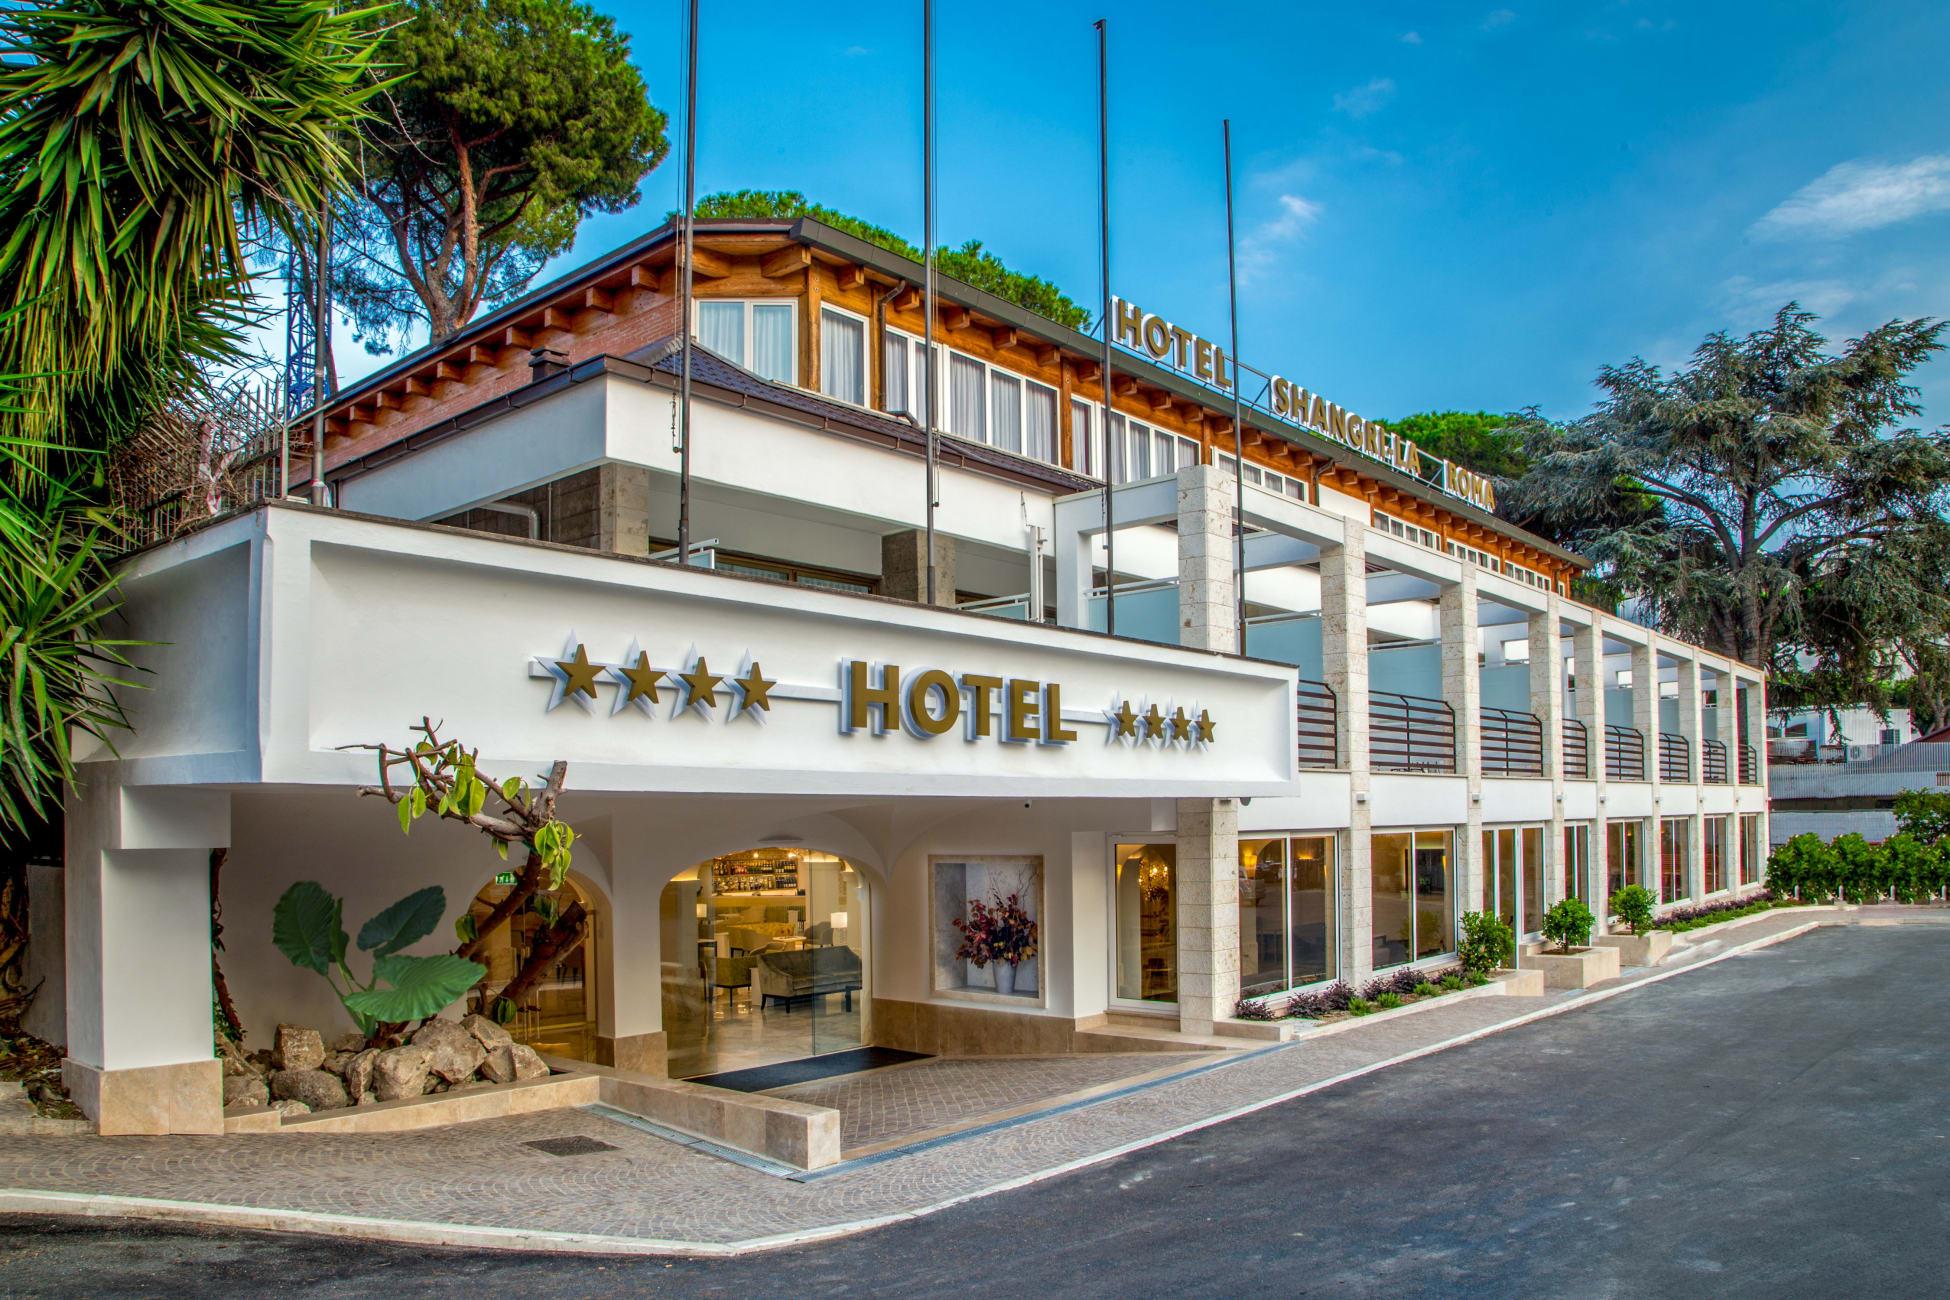 Hotel Shangri La Roma Rome Trivago Co Uk